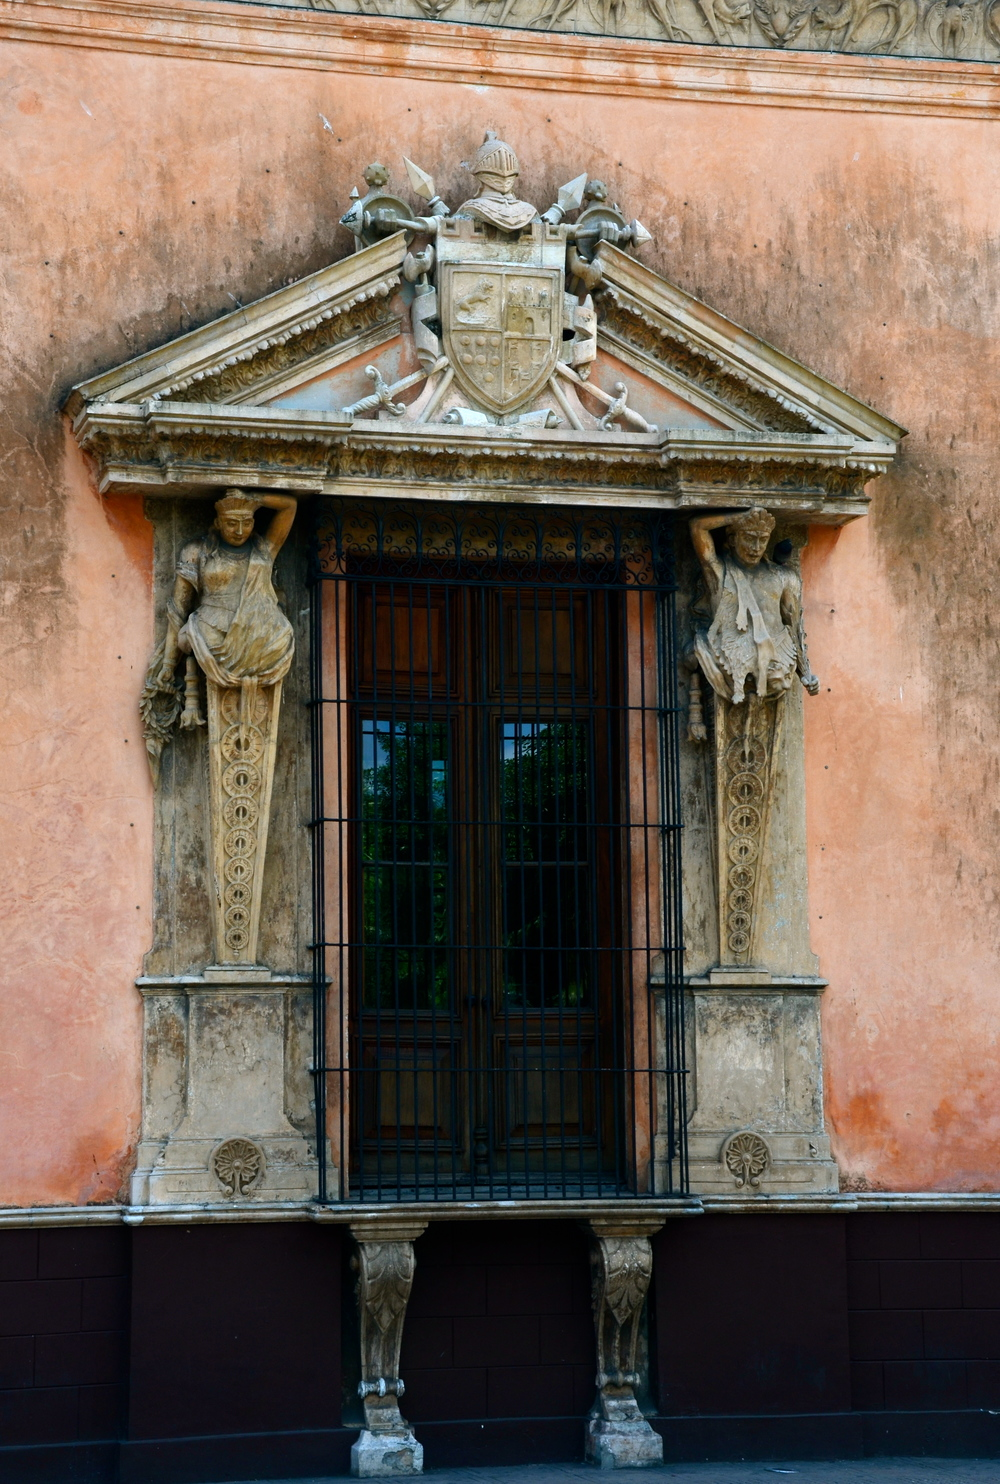 House of Montejo. Francisco de Montejo was a spanish conquistador who founded Merdia in 1542.